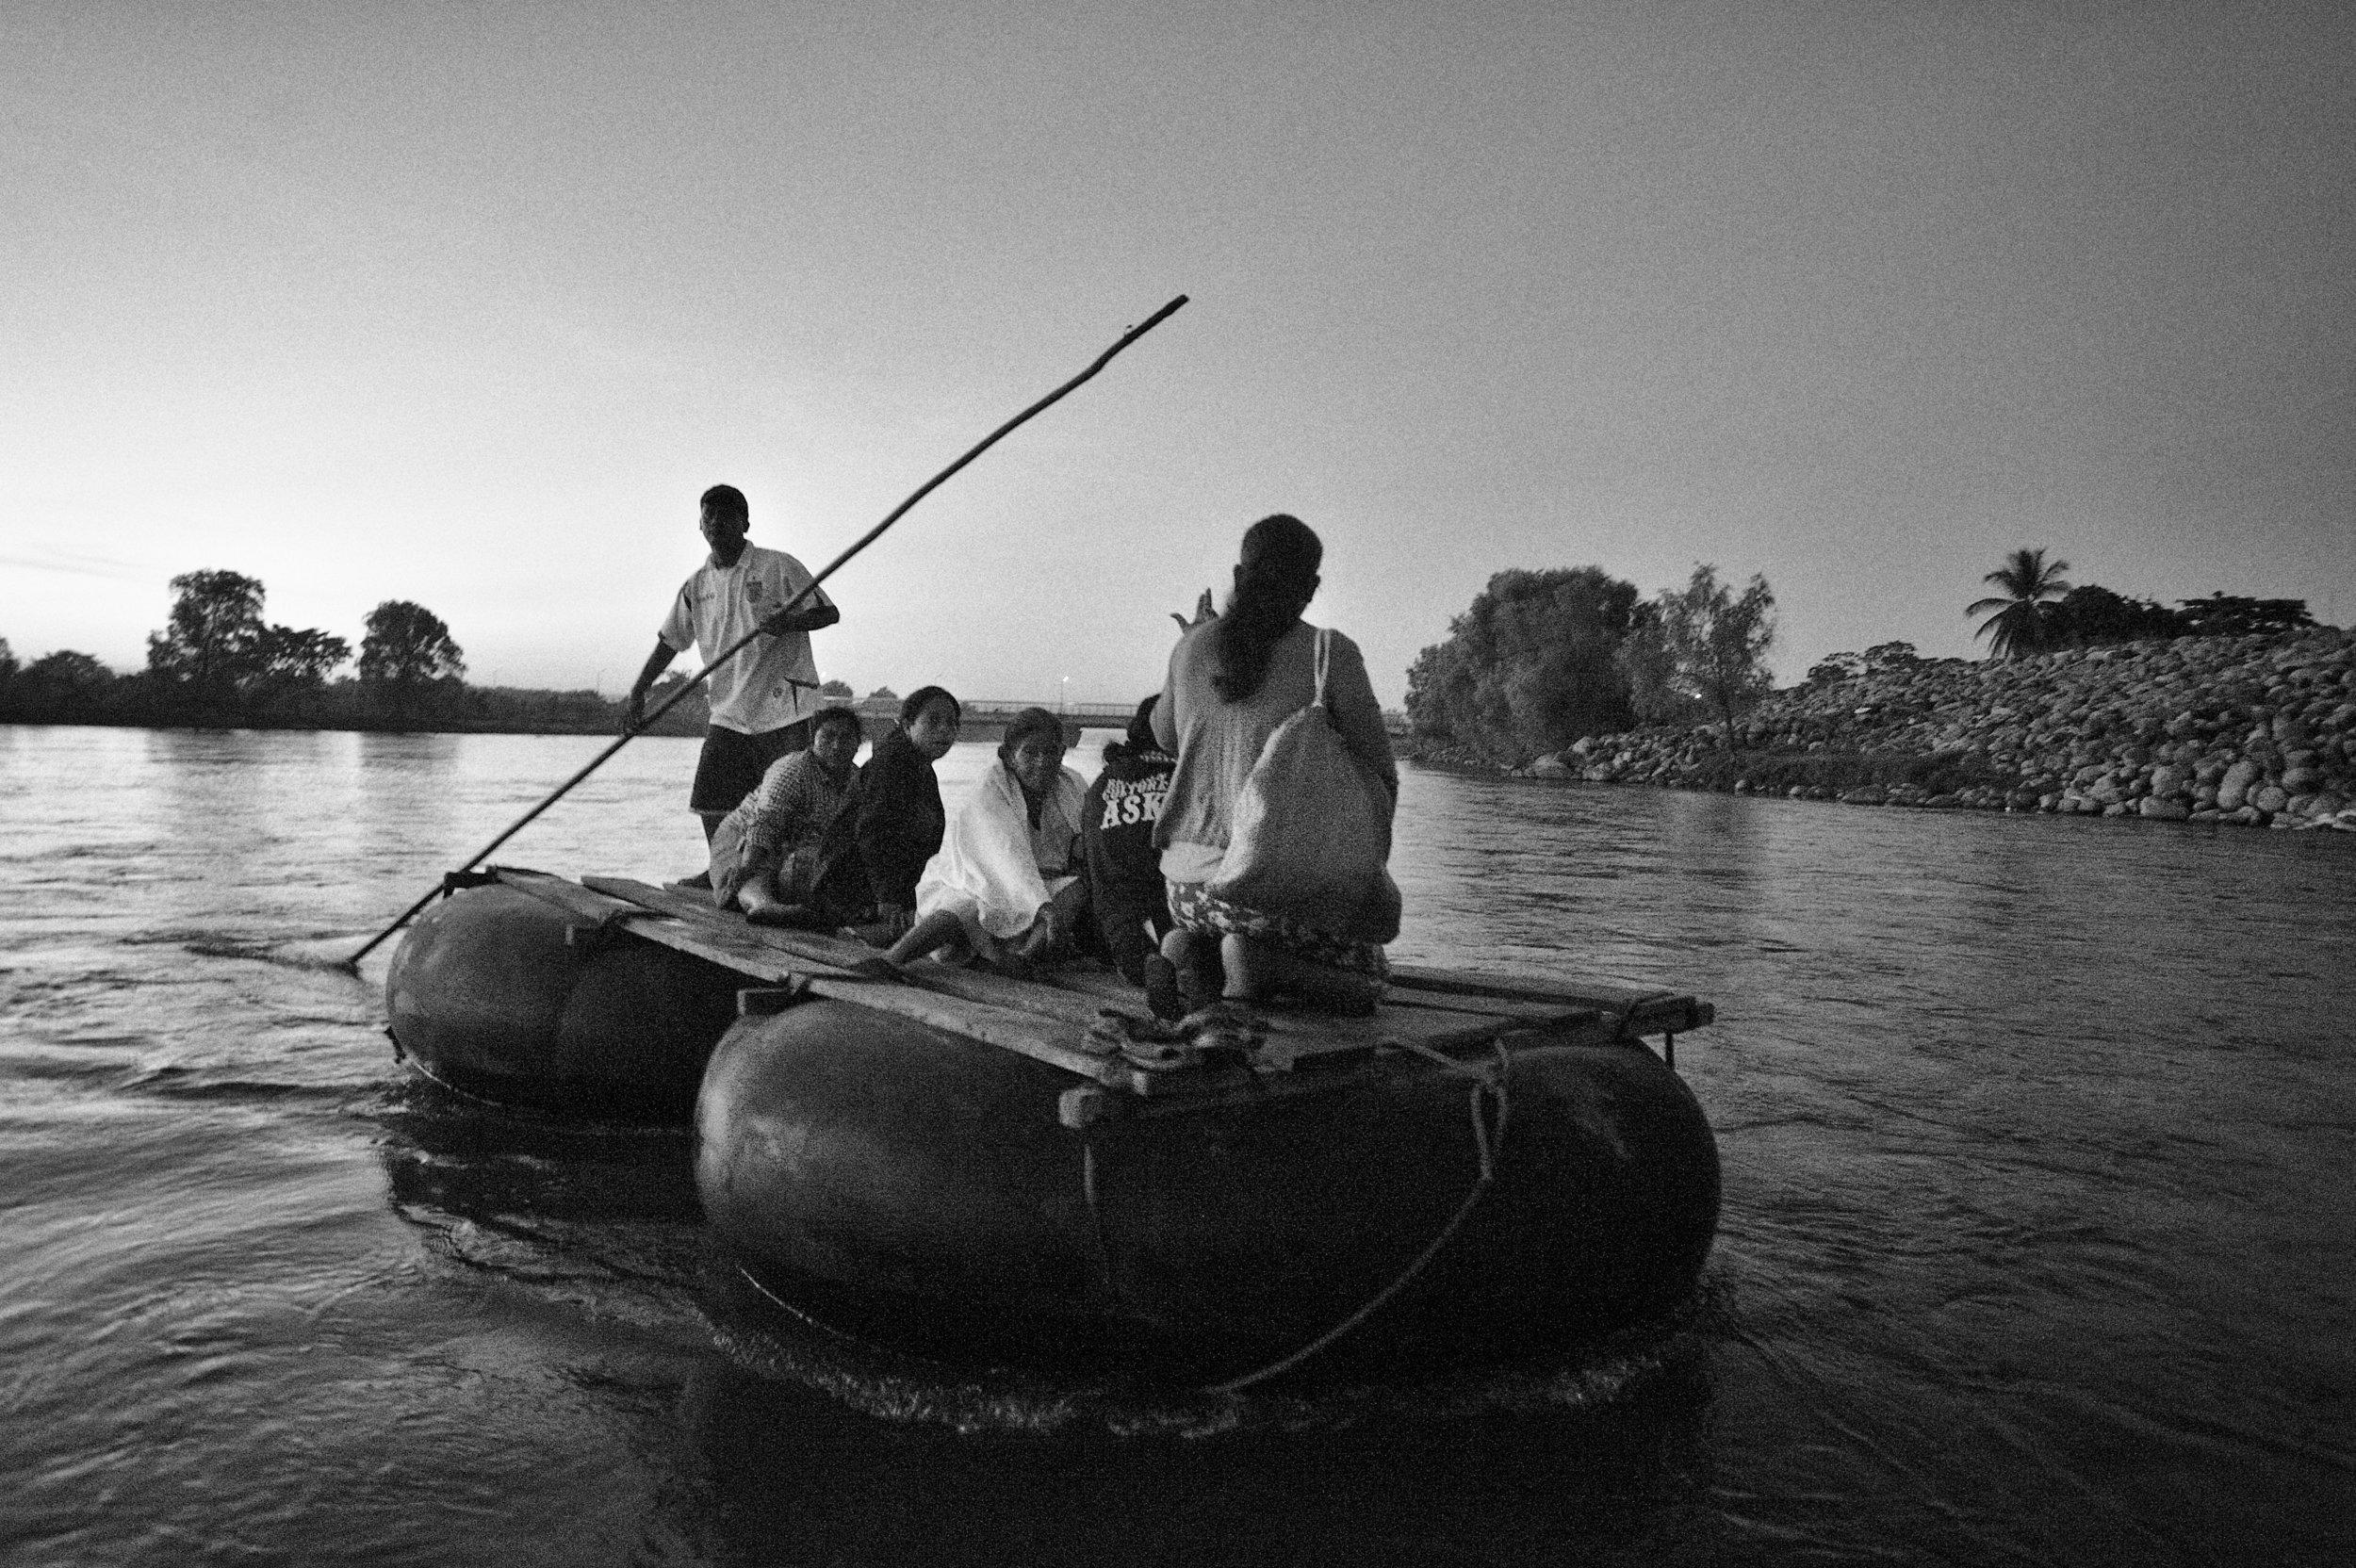 Via Panam, migration in the America's, Guatemala